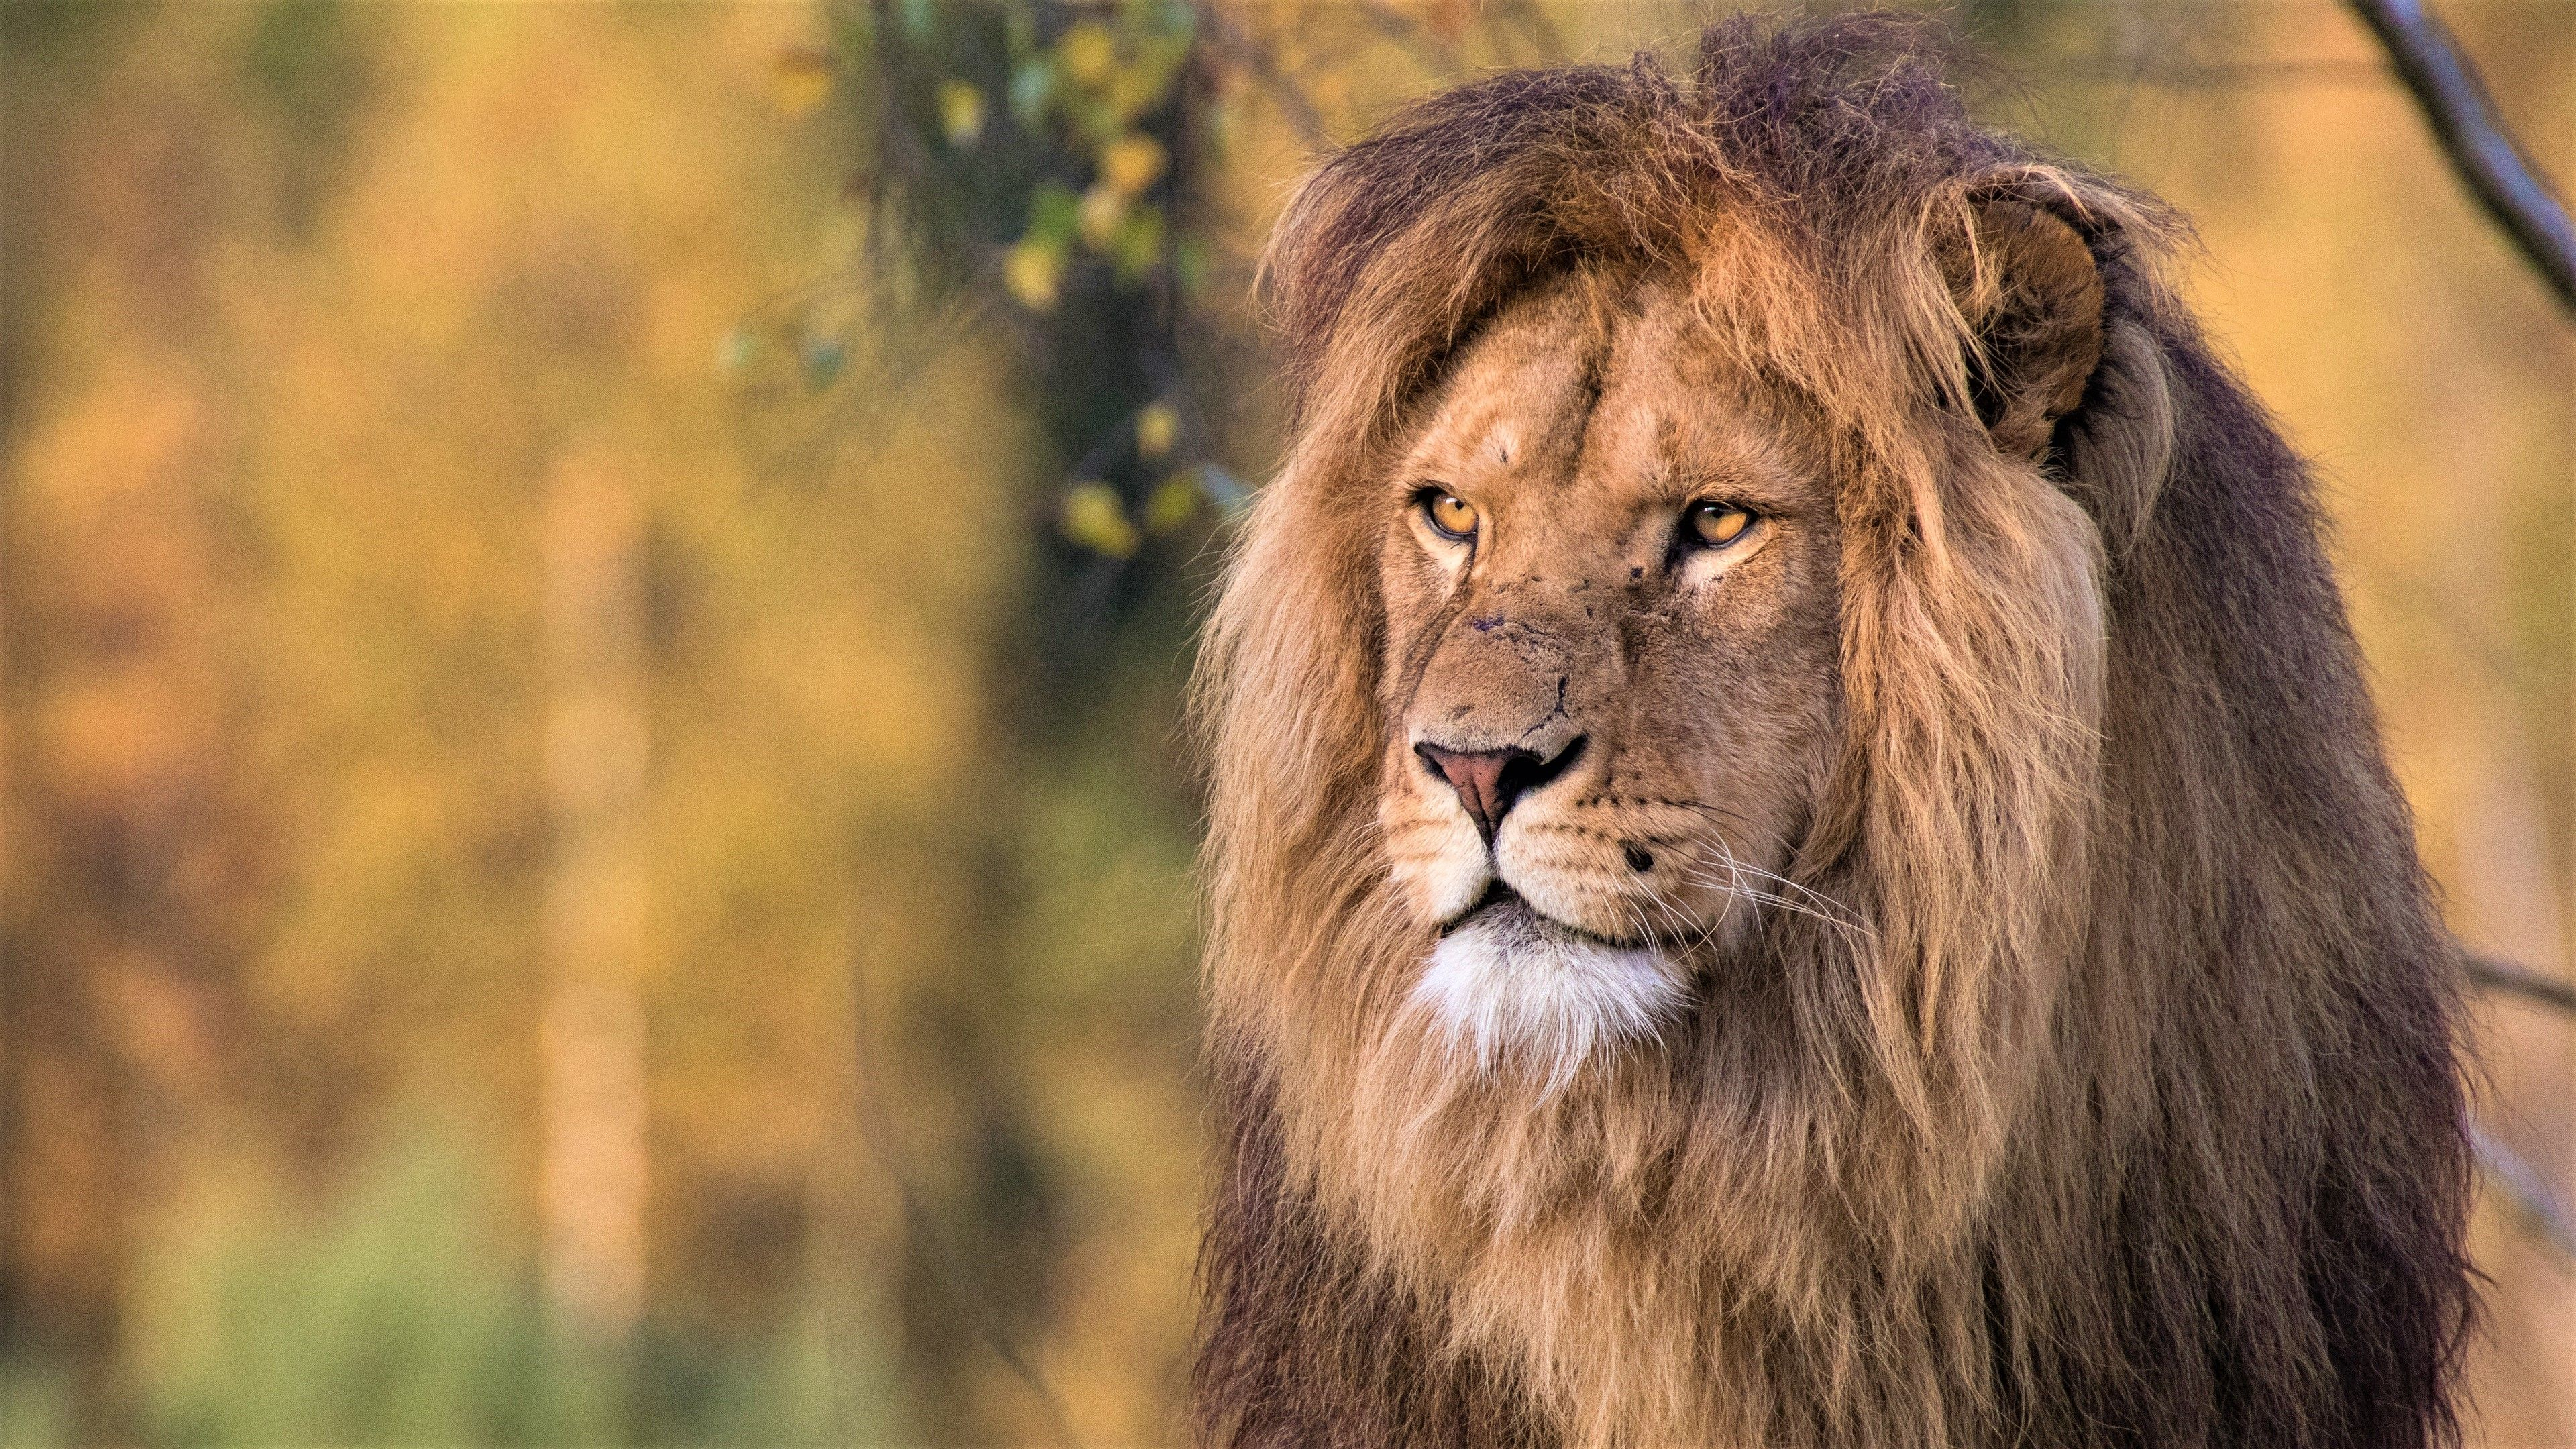 Lion 4k Wallpapers - Wallpaper Cave